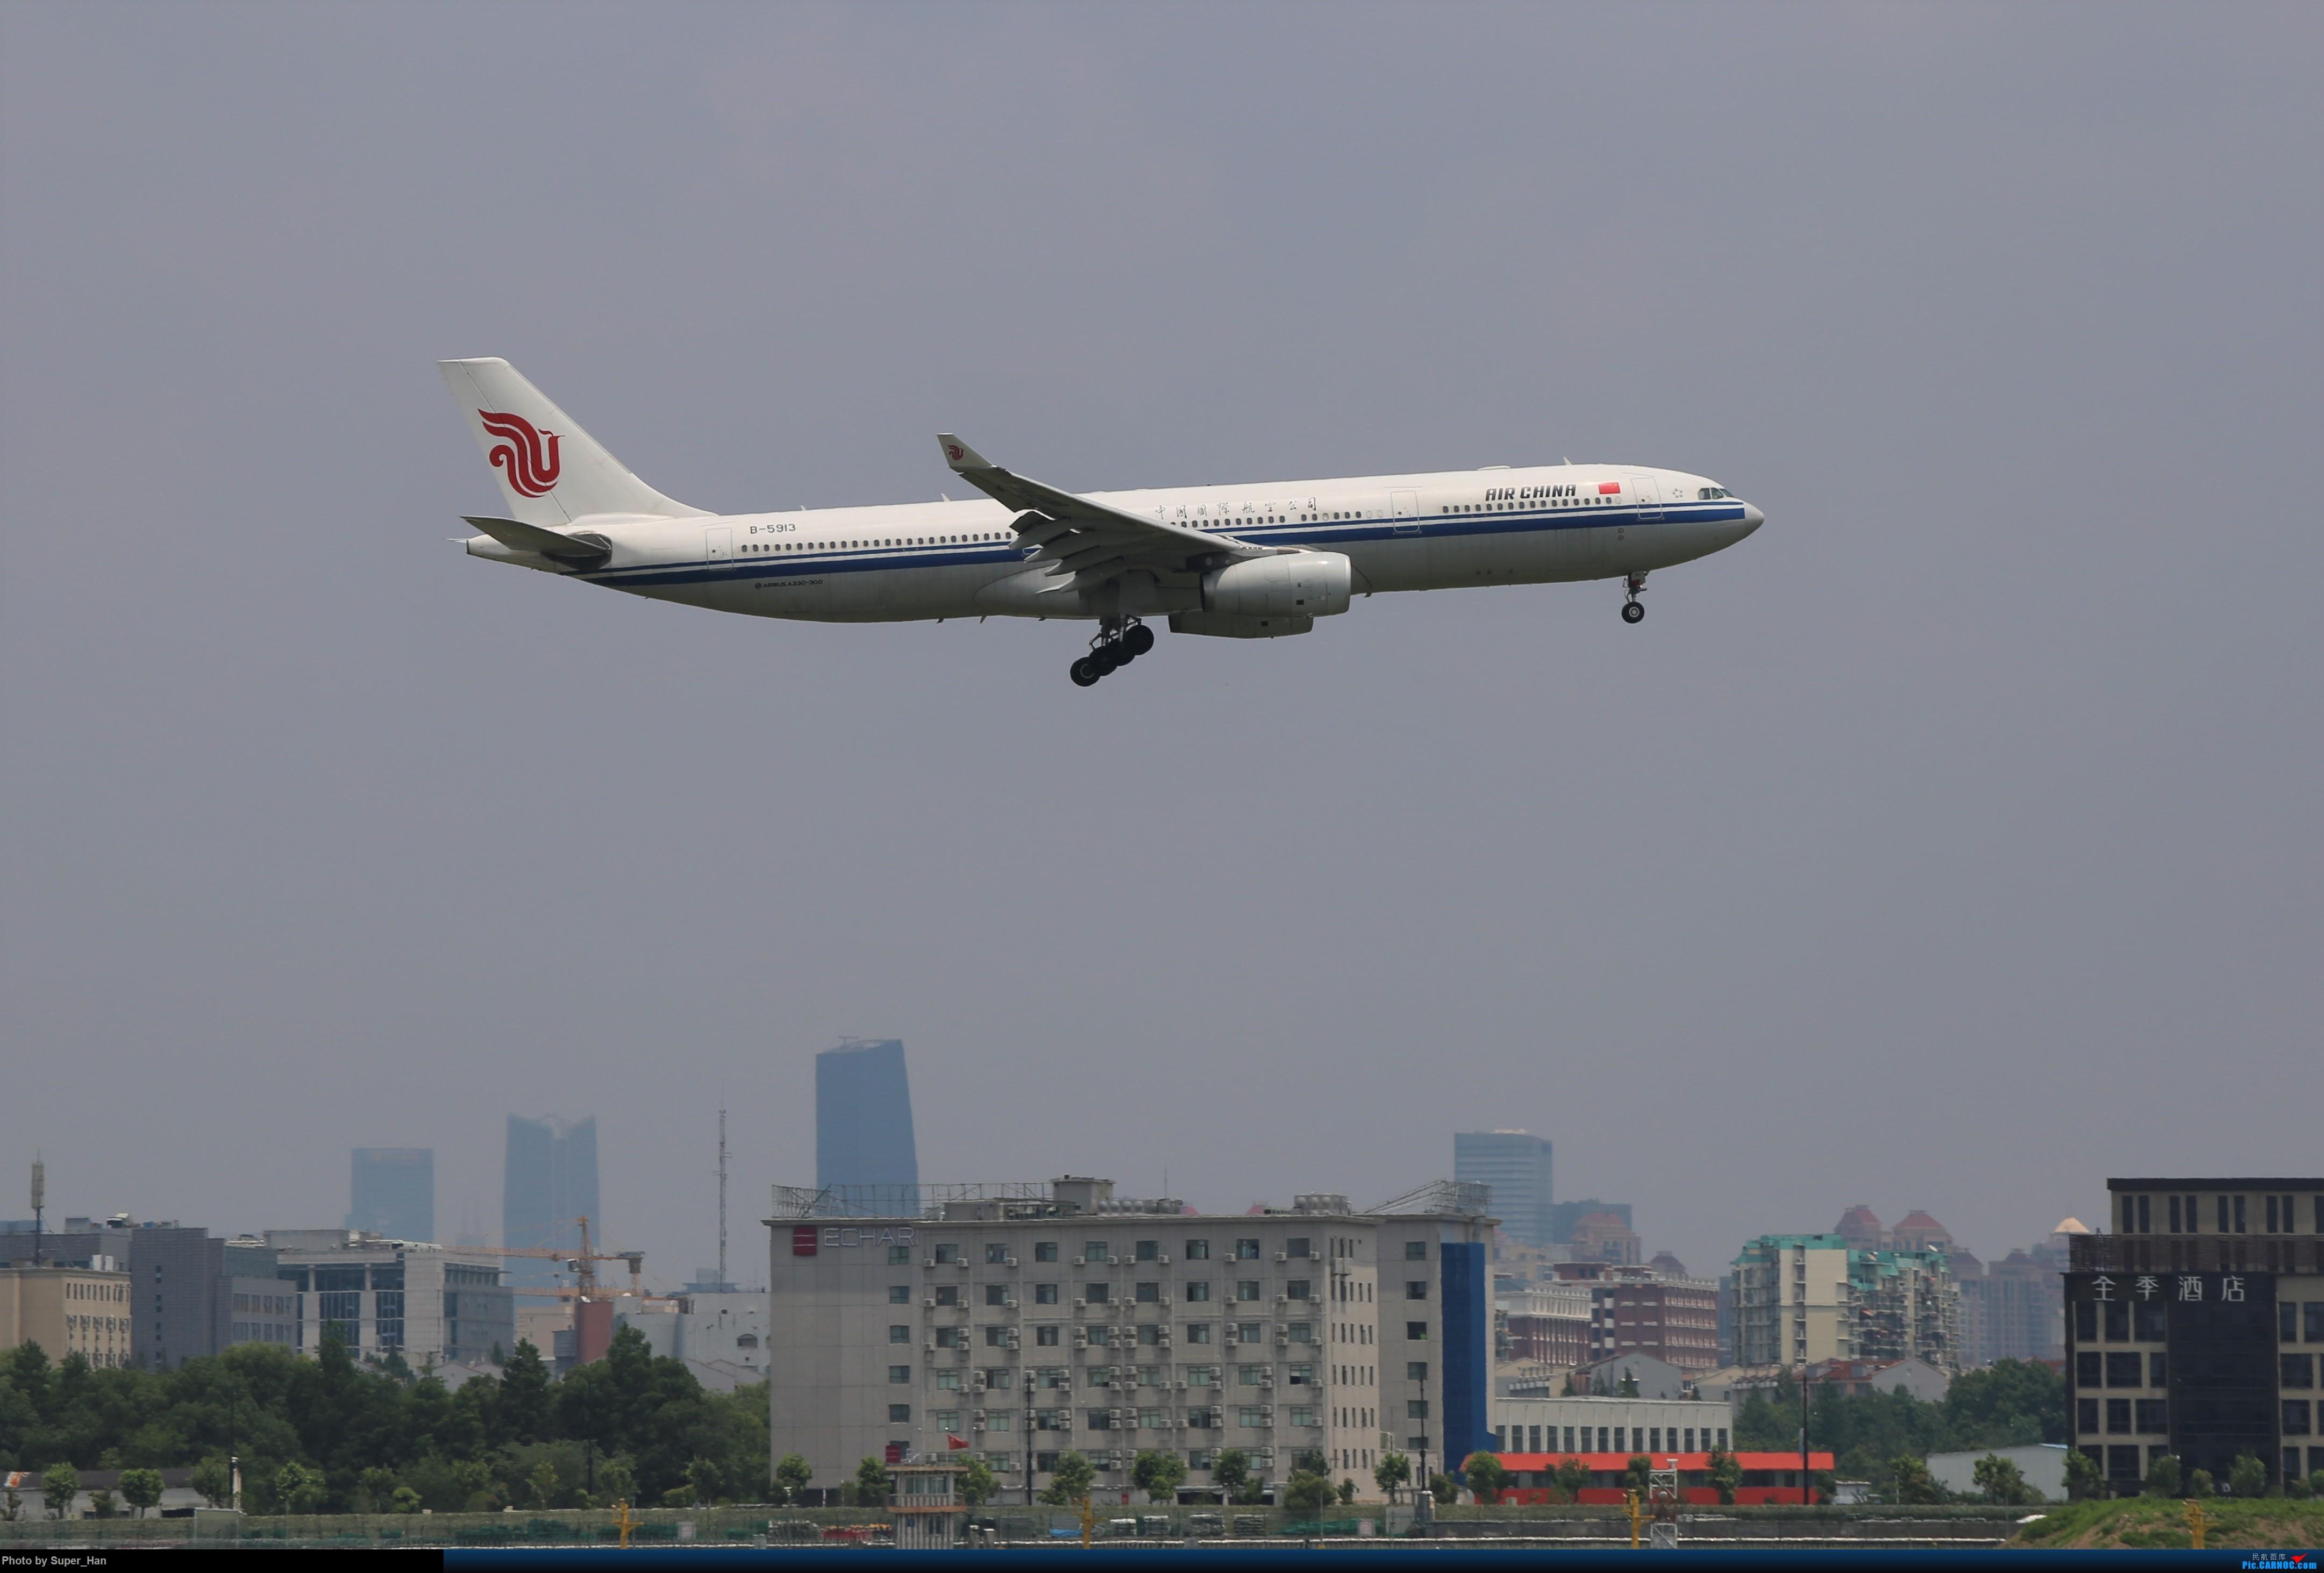 Re:[原创]0715去虹桥说走就走【最多的330篇】 AIRBUS A330-300 B-5913 中国上海虹桥国际机场